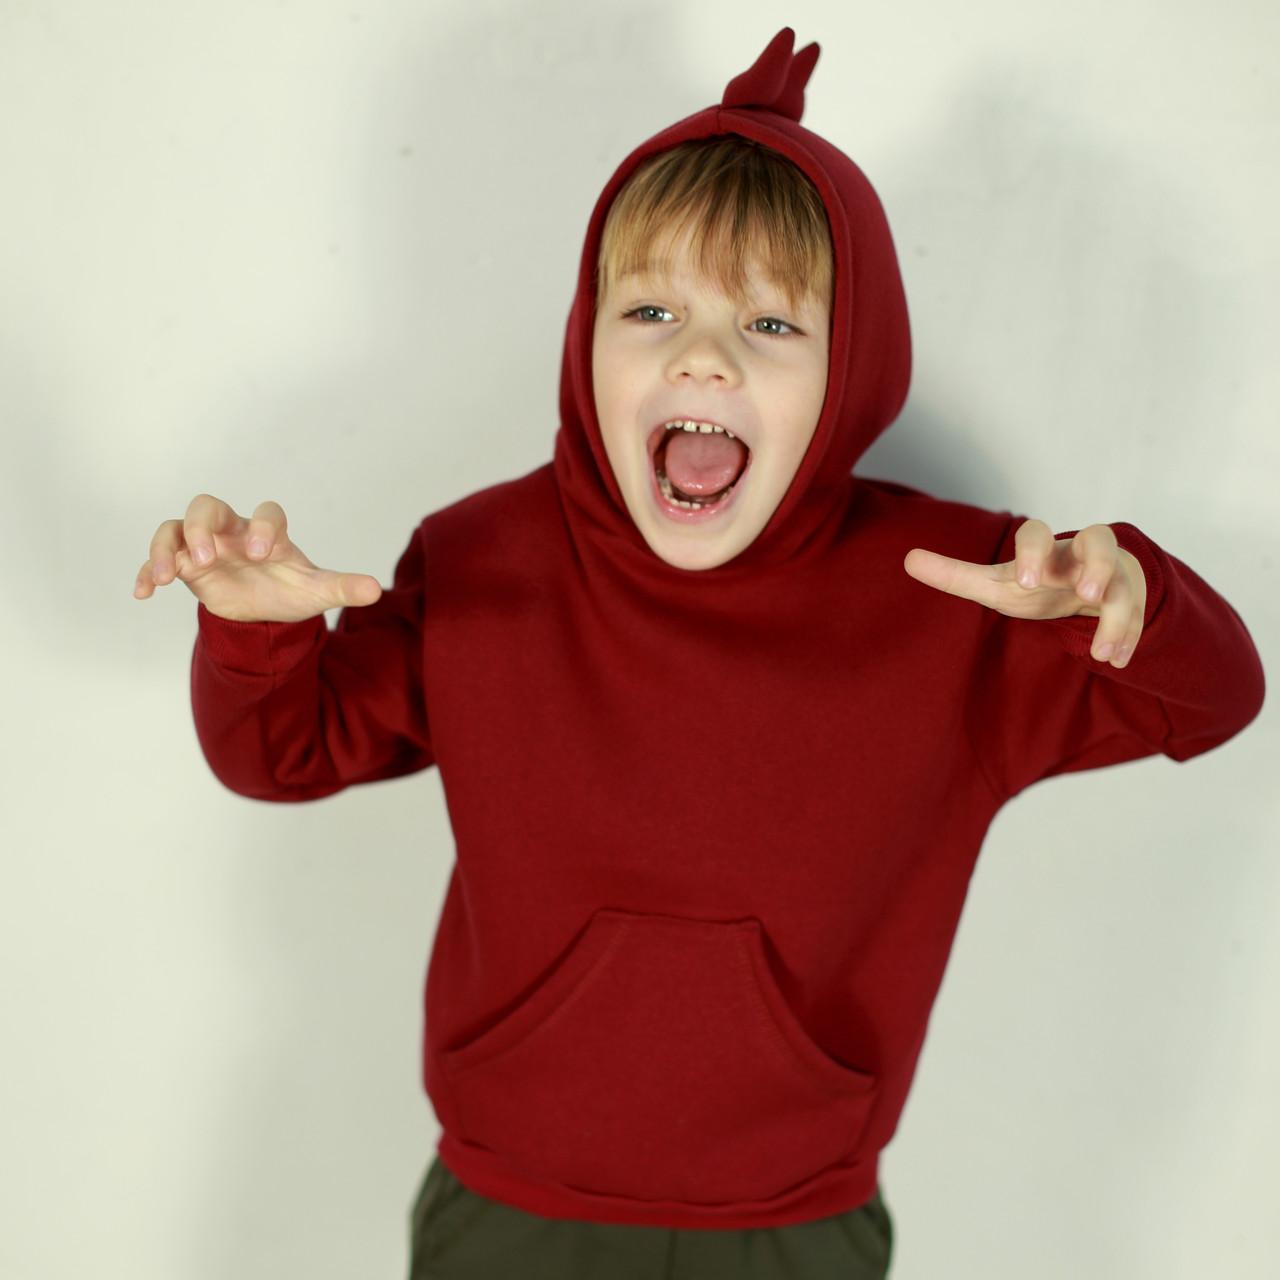 "Худи (толстовка) для ребенка ""Дино"". Динохуди на флисе | Толстовка дитяча ""Діно"""